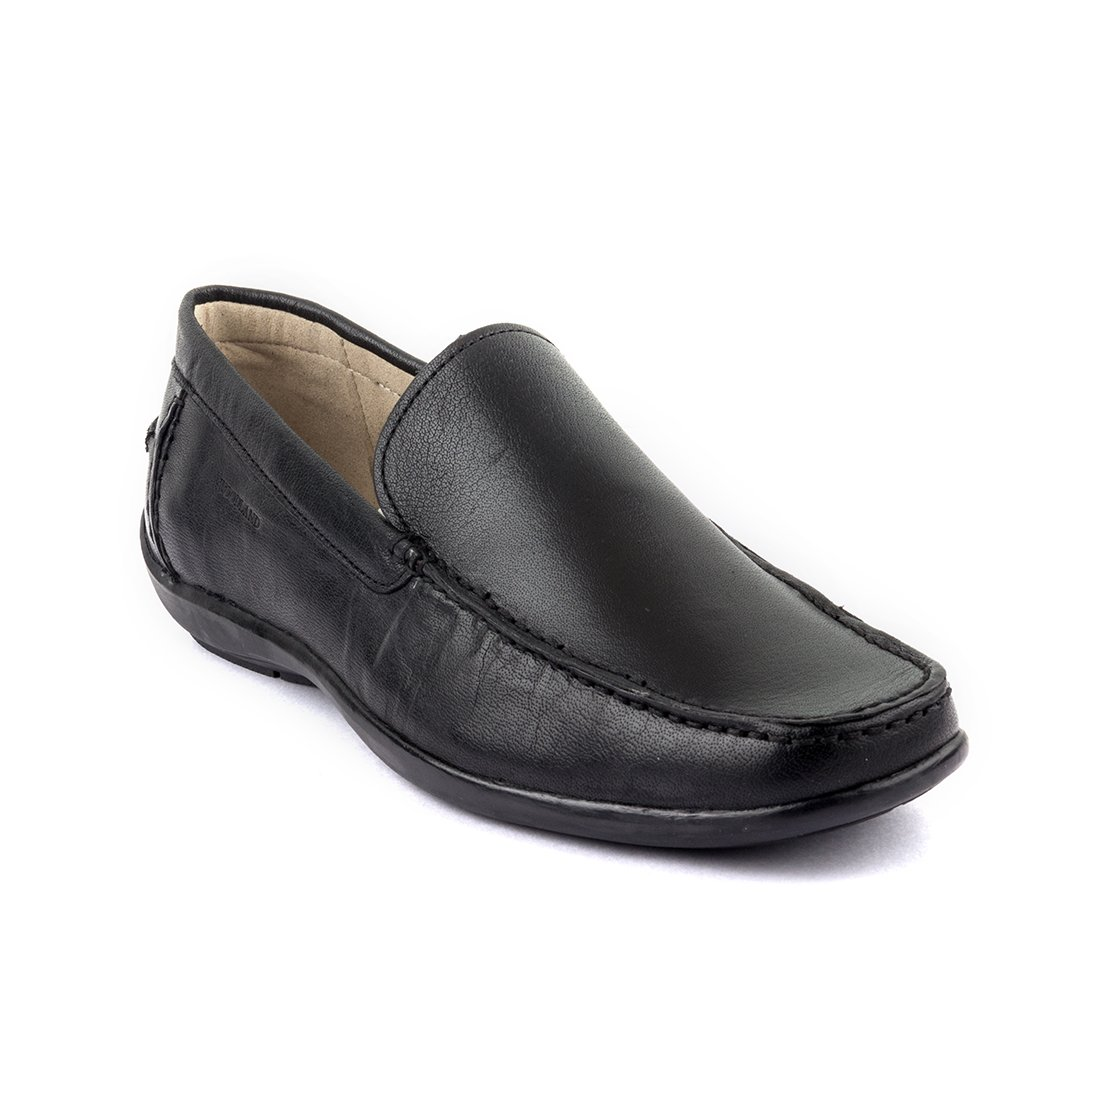 Black Formal Shoes-UK-8 at Amazon